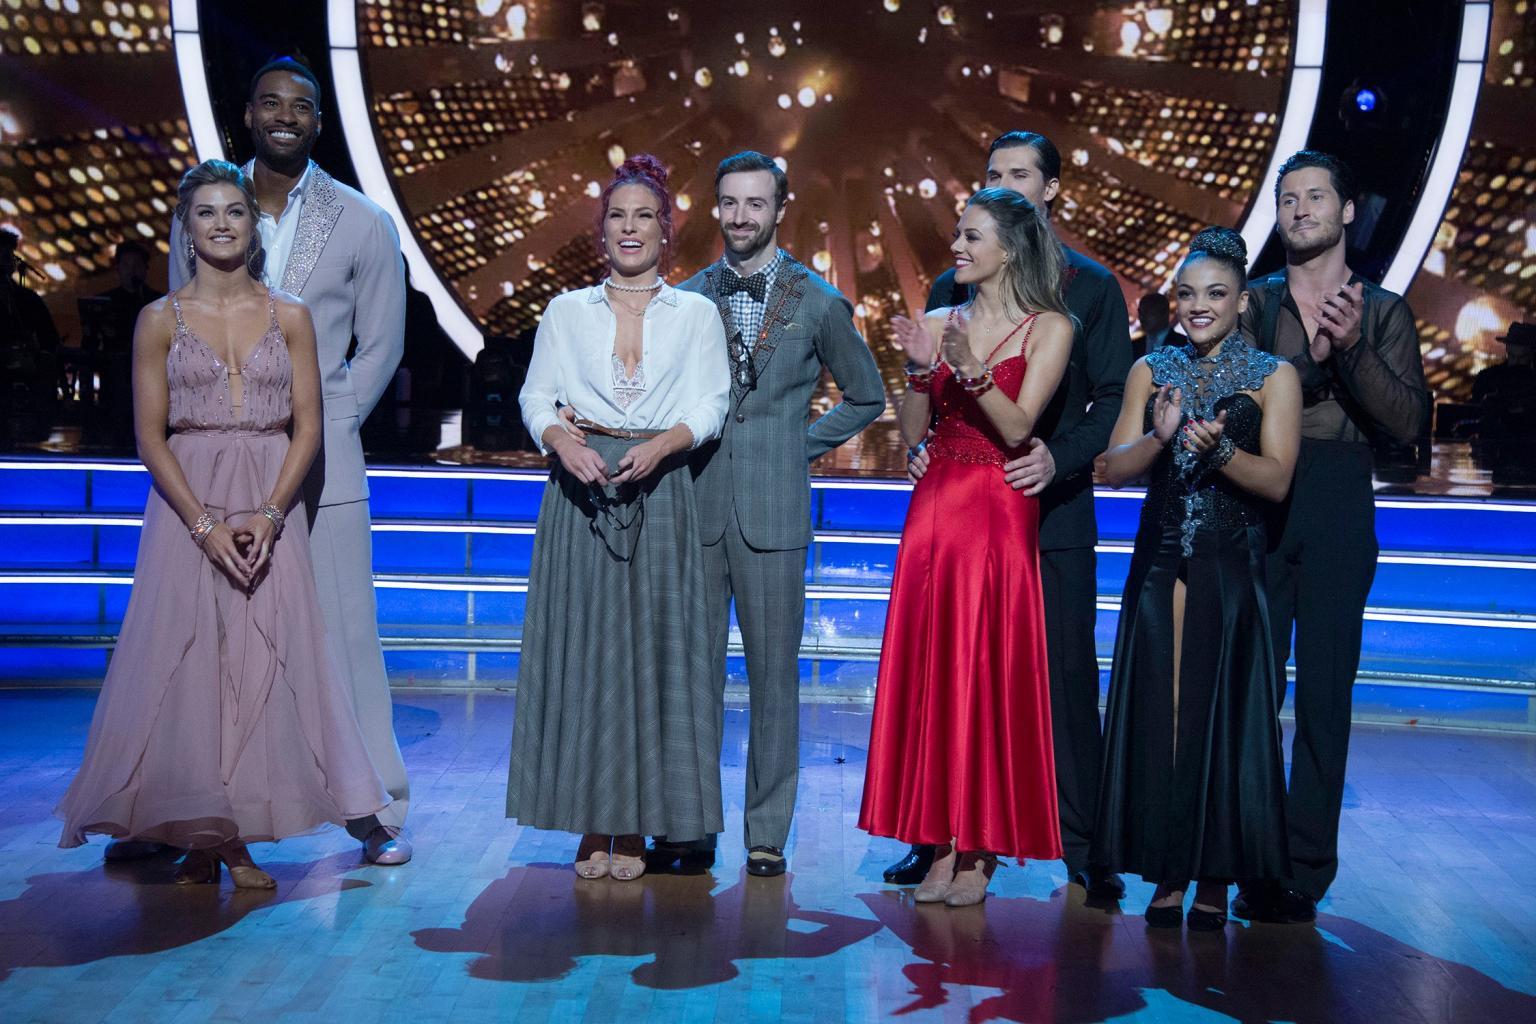 Dancing with the Stars Crowns Laurie Hernandez as Its Season 23 Mirrorball Trophy Winner